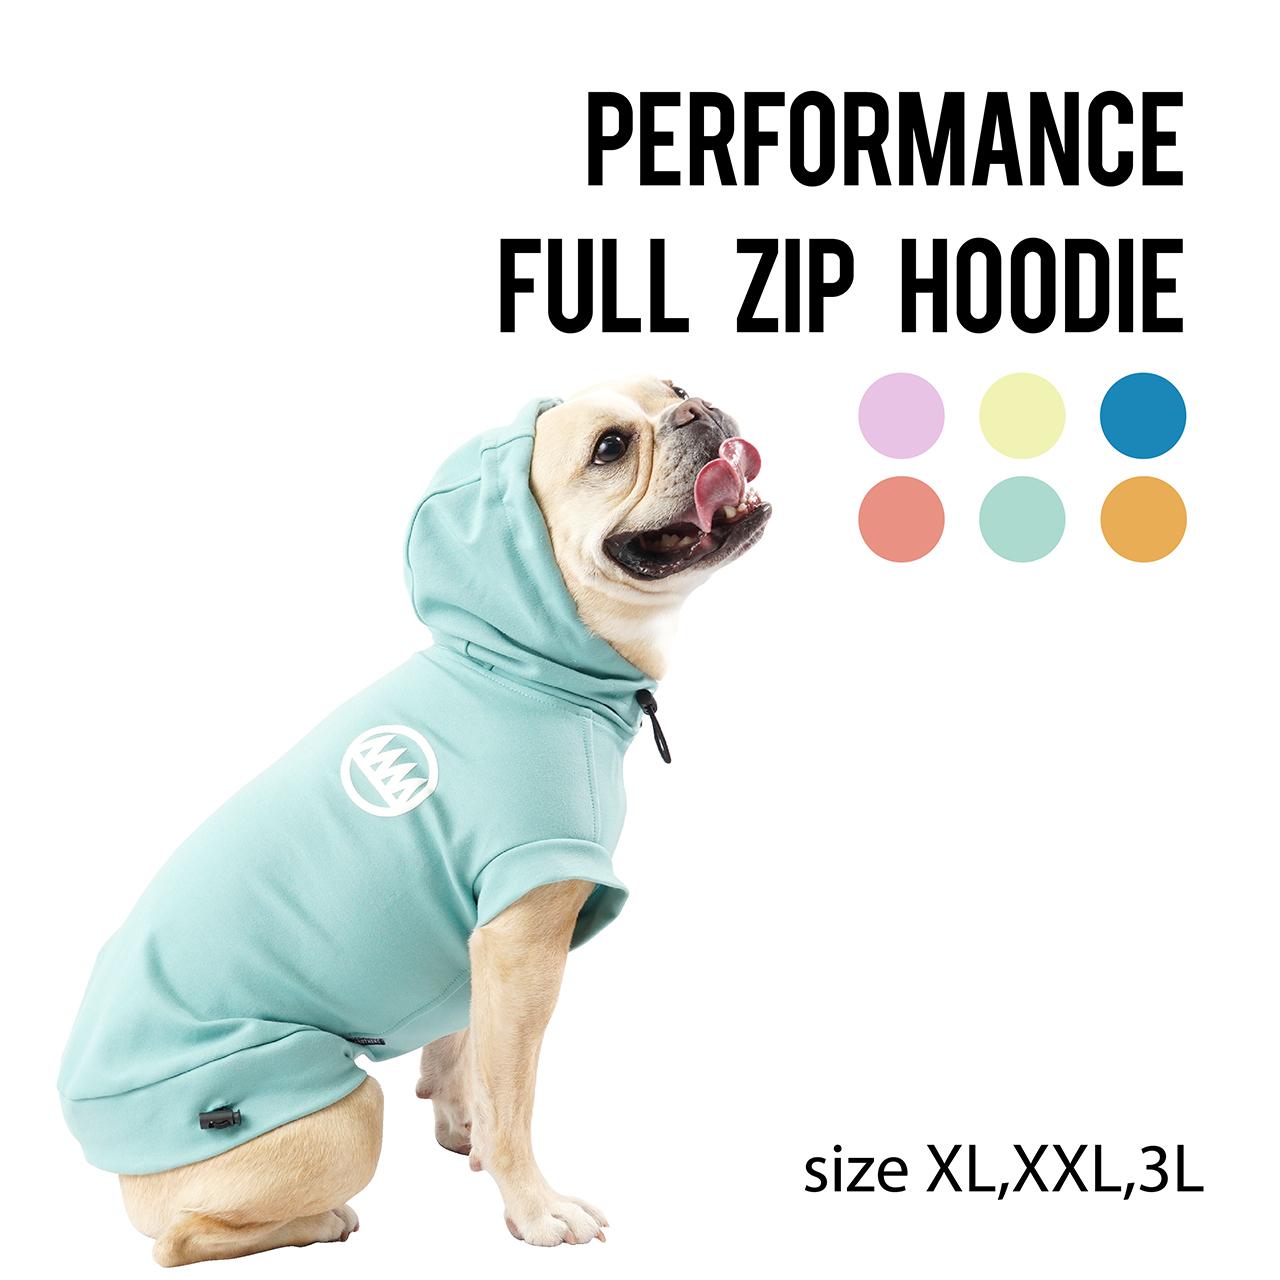 PERFORMANCE FULL ZIP HOODIE(XL~3L) パフォーマンスフルジップフーディ